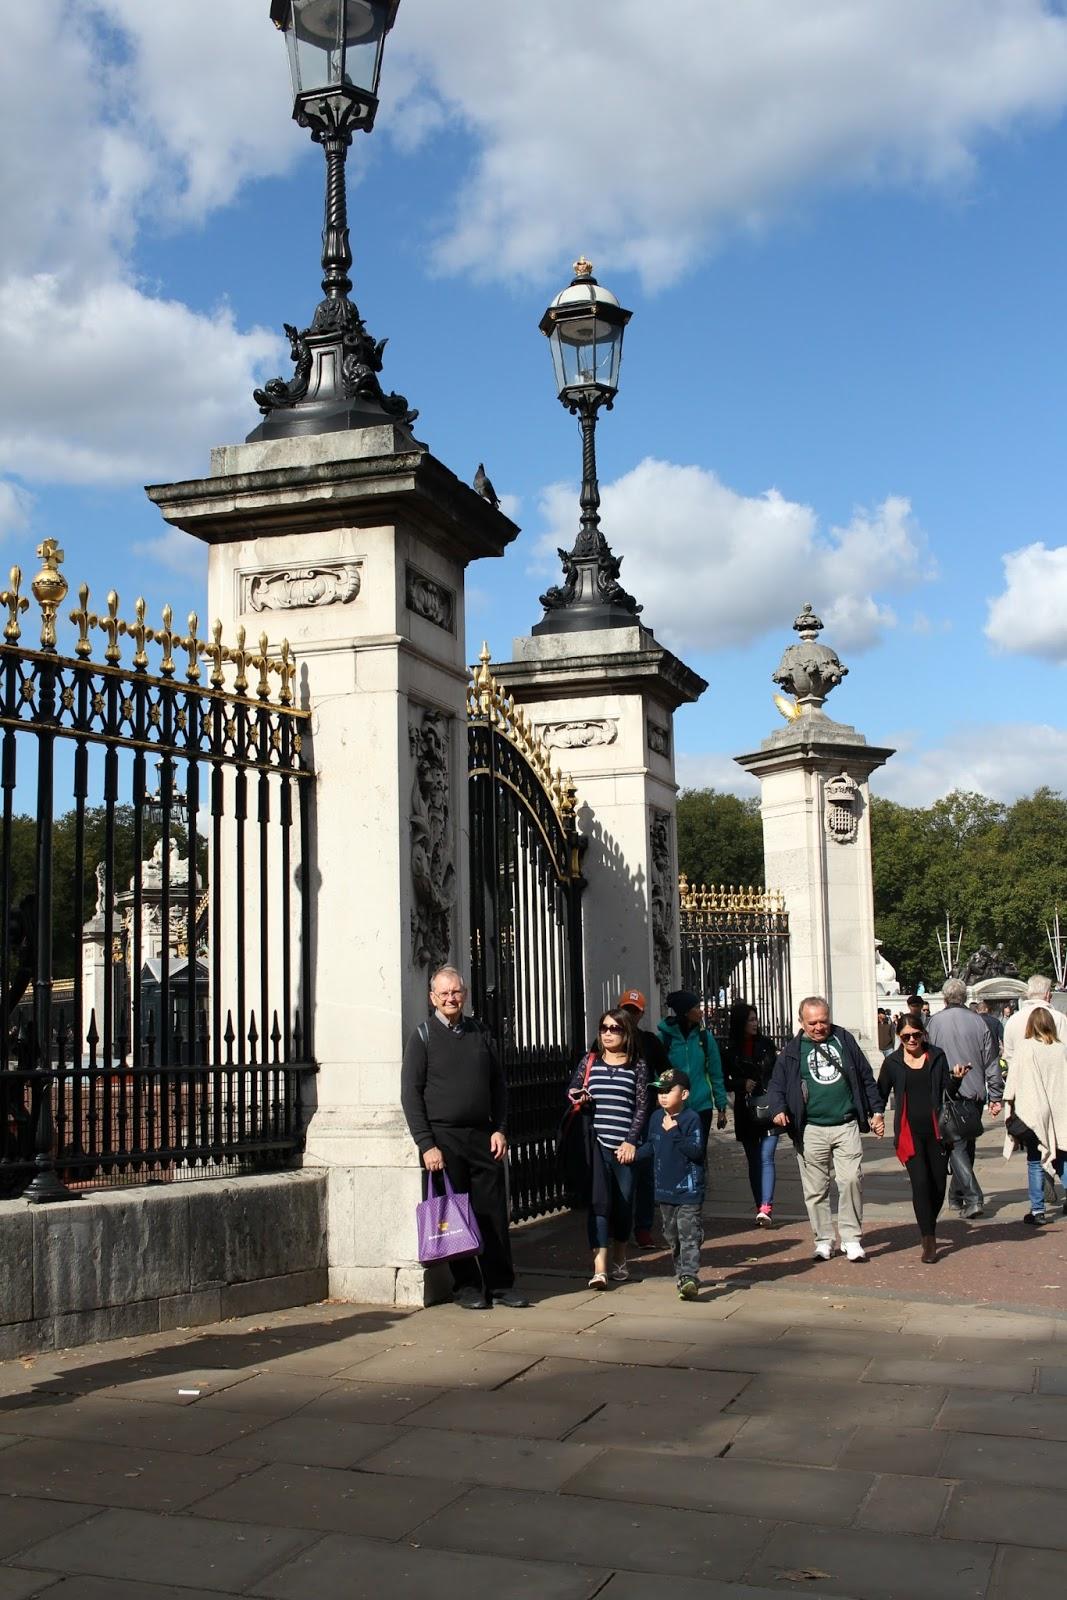 Buckingham palace the royal mews grateful prayer